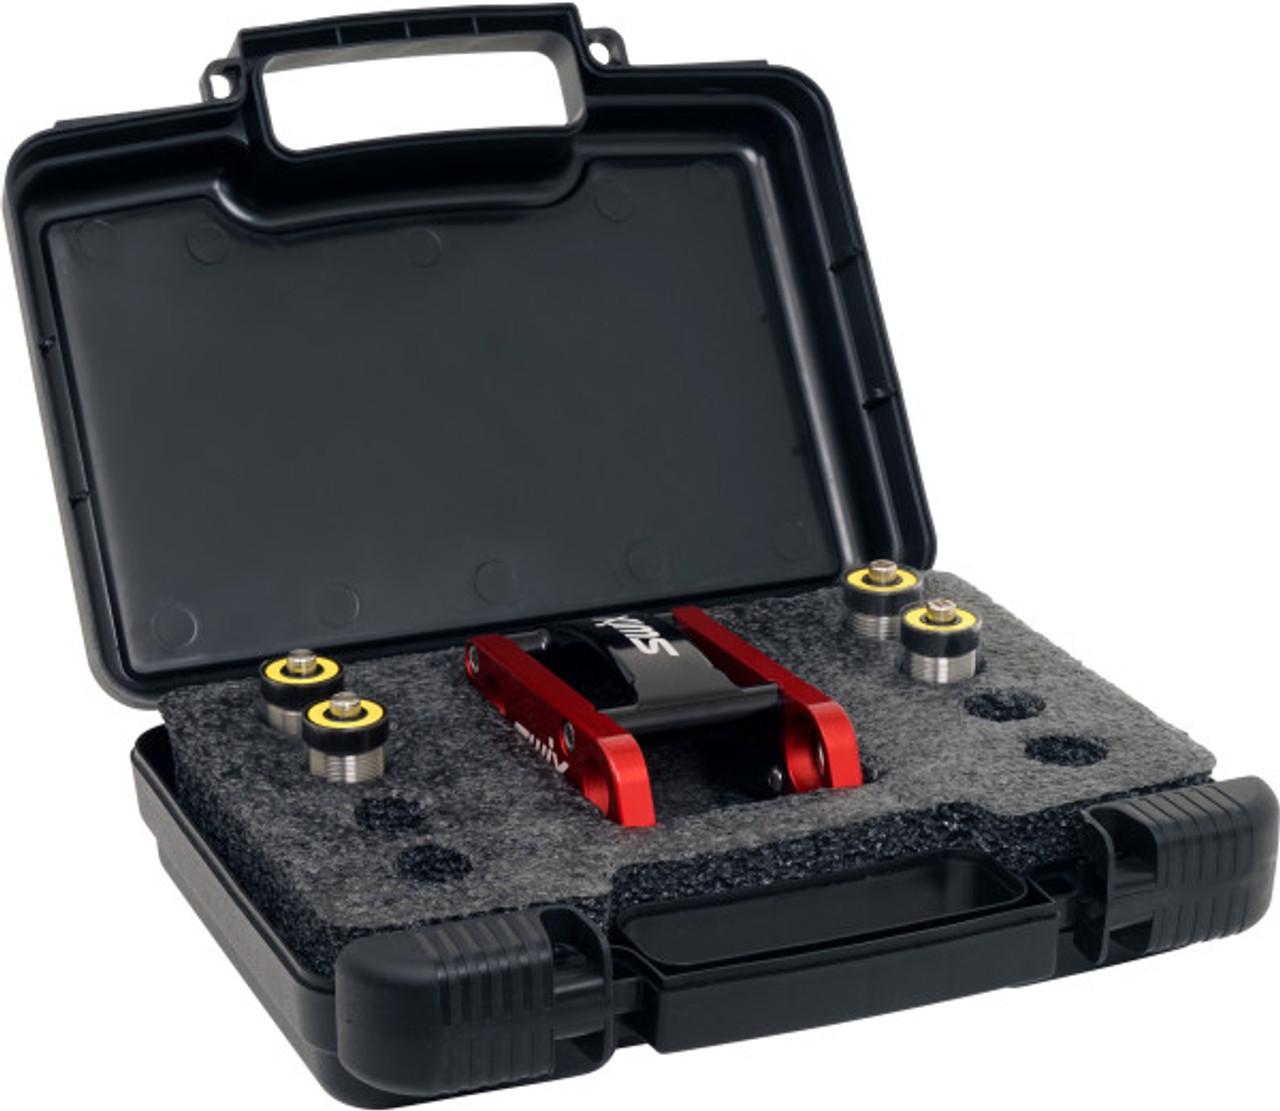 Swix T48P Nordic Structure Tool Kit (T048P)